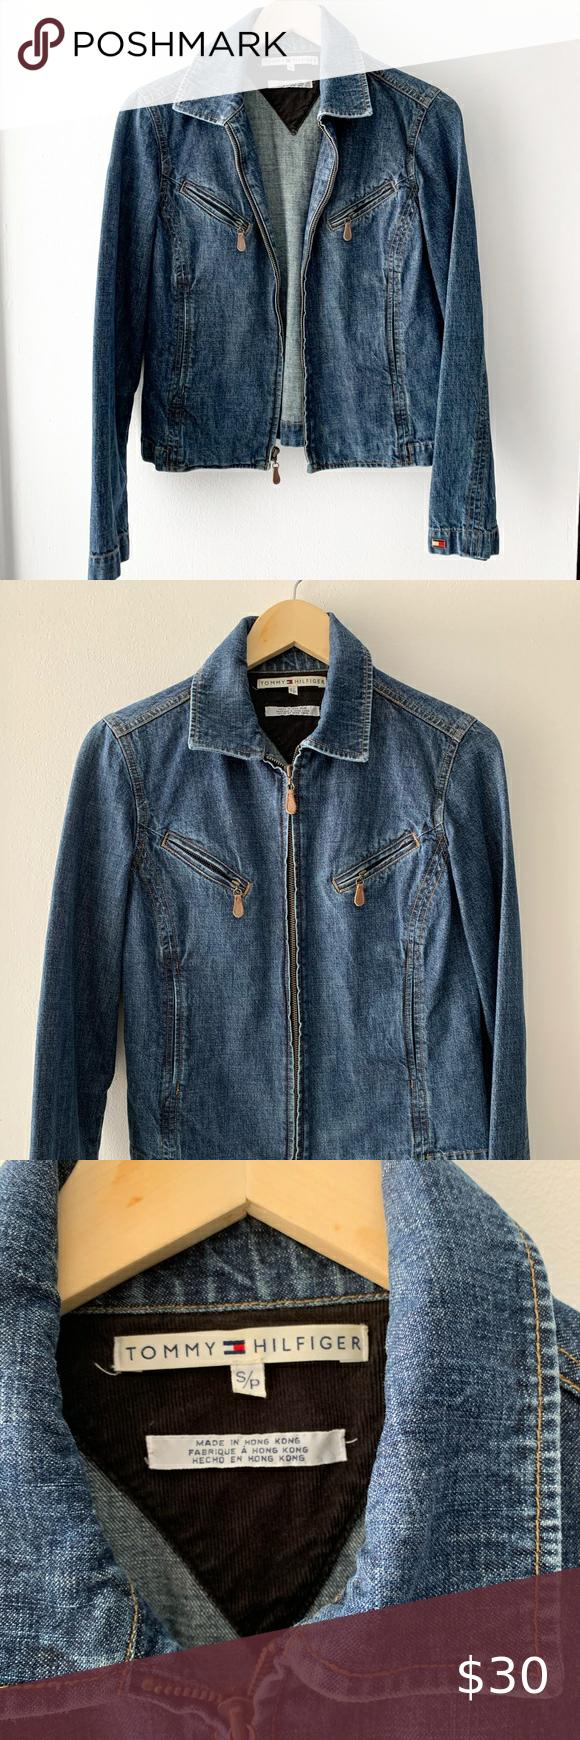 Vintage Tommy Hilfiger Denim Jean Jacket Vintage Denim Jacket Hilfiger Denim Lined Denim Jacket [ 1740 x 580 Pixel ]